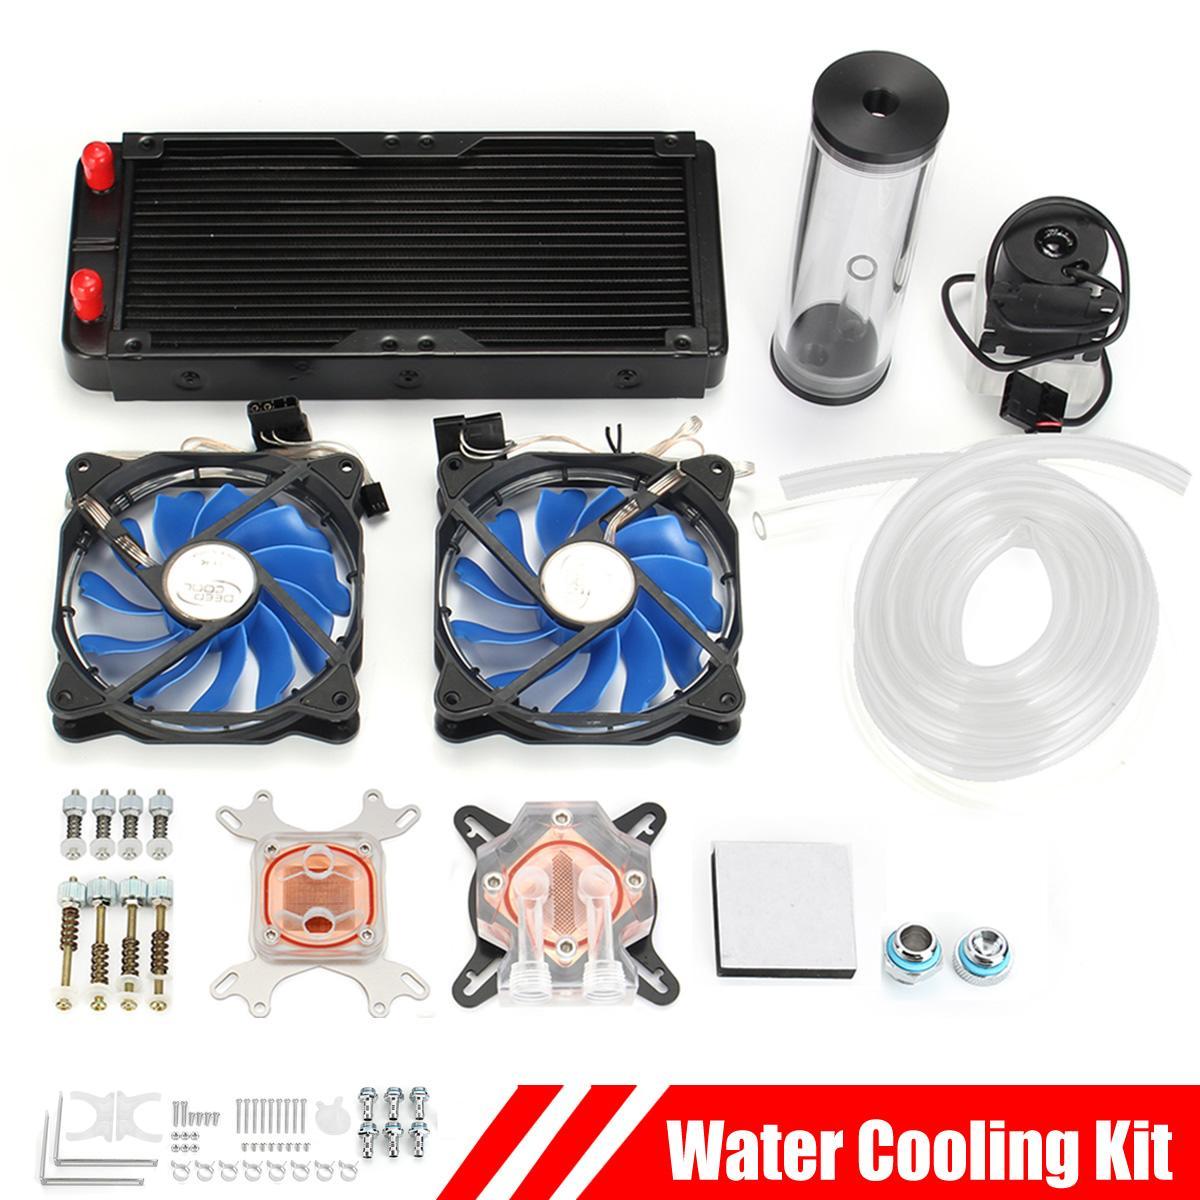 Leory PC Water Cooling Kit 240mm Radiator Pump Reservoir CPU Block Rigid Tubes DIY Circulation Pump